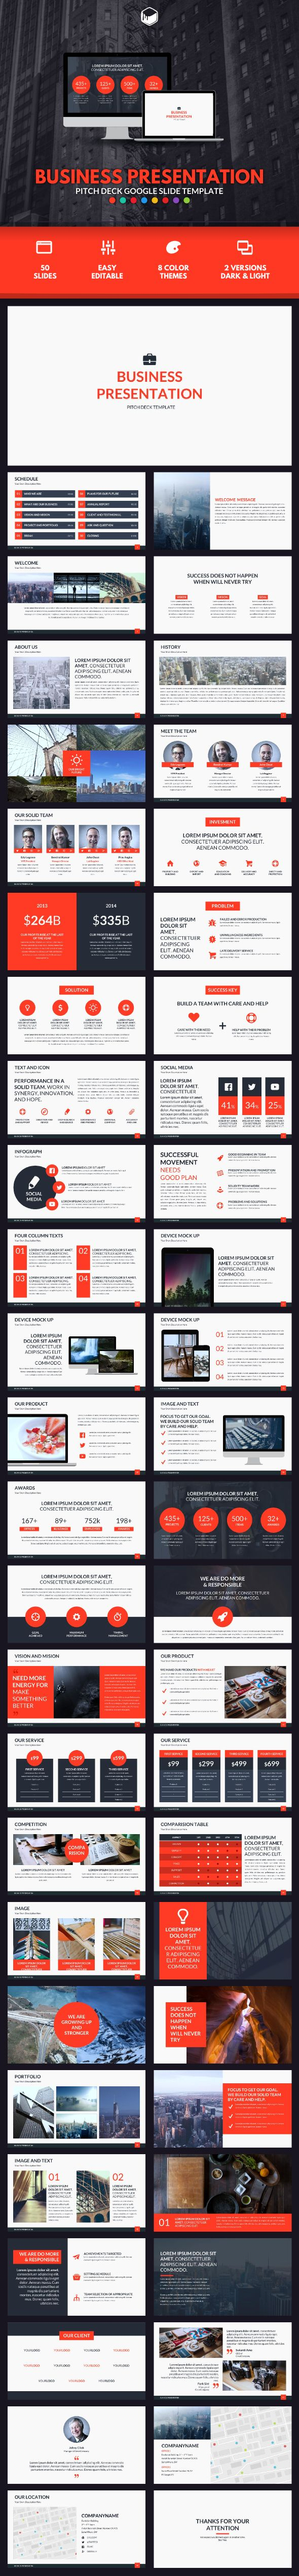 Business Presentation - Pitch Deck Google Slide Template #design Download: http://graphicriver.net/item/business-presentation-pitch-deck-google-slide-template/14376118?ref=ksioks